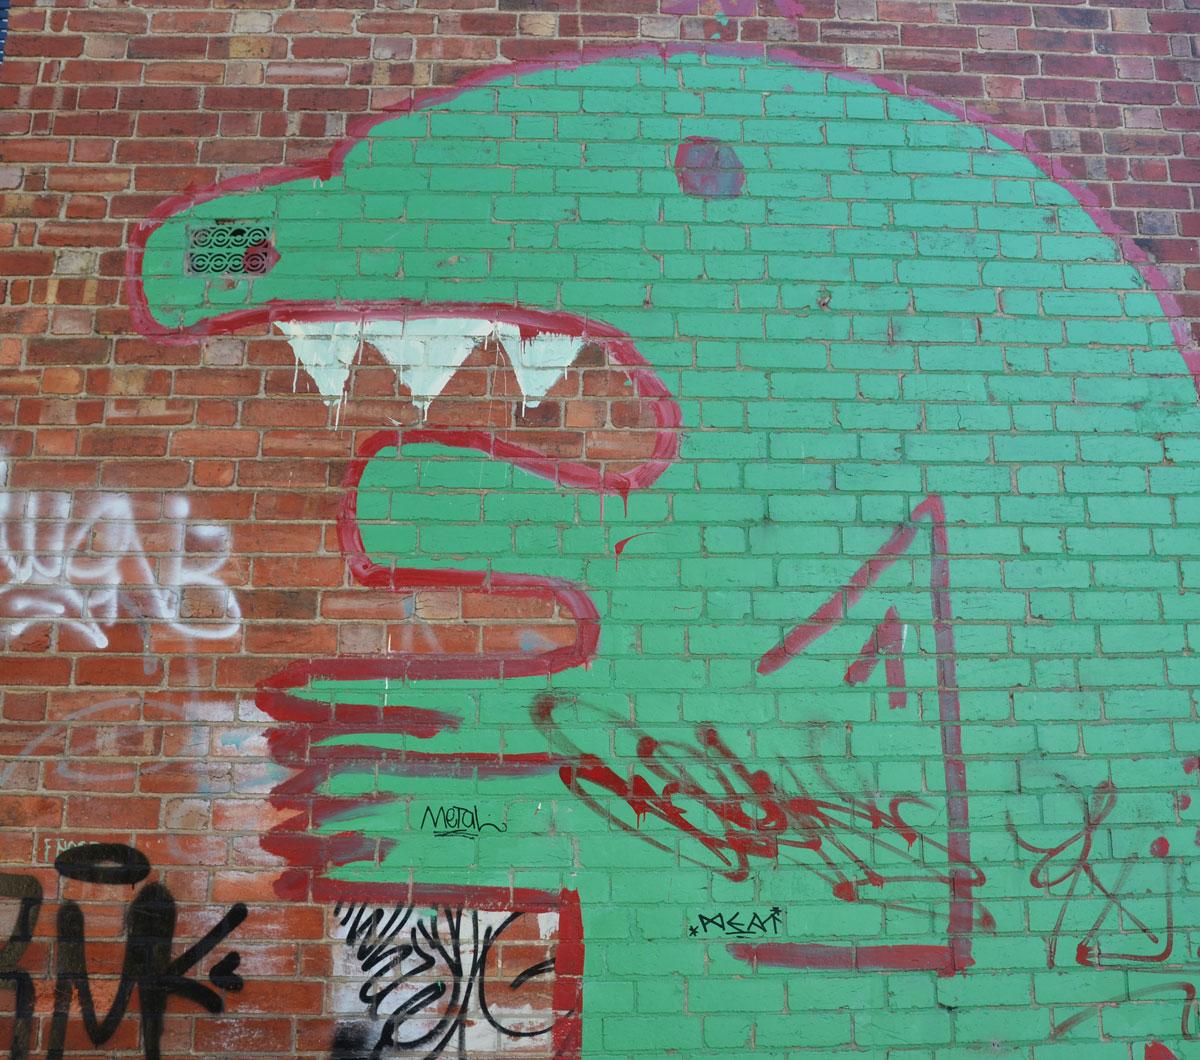 green monster street art painting on a brick wall